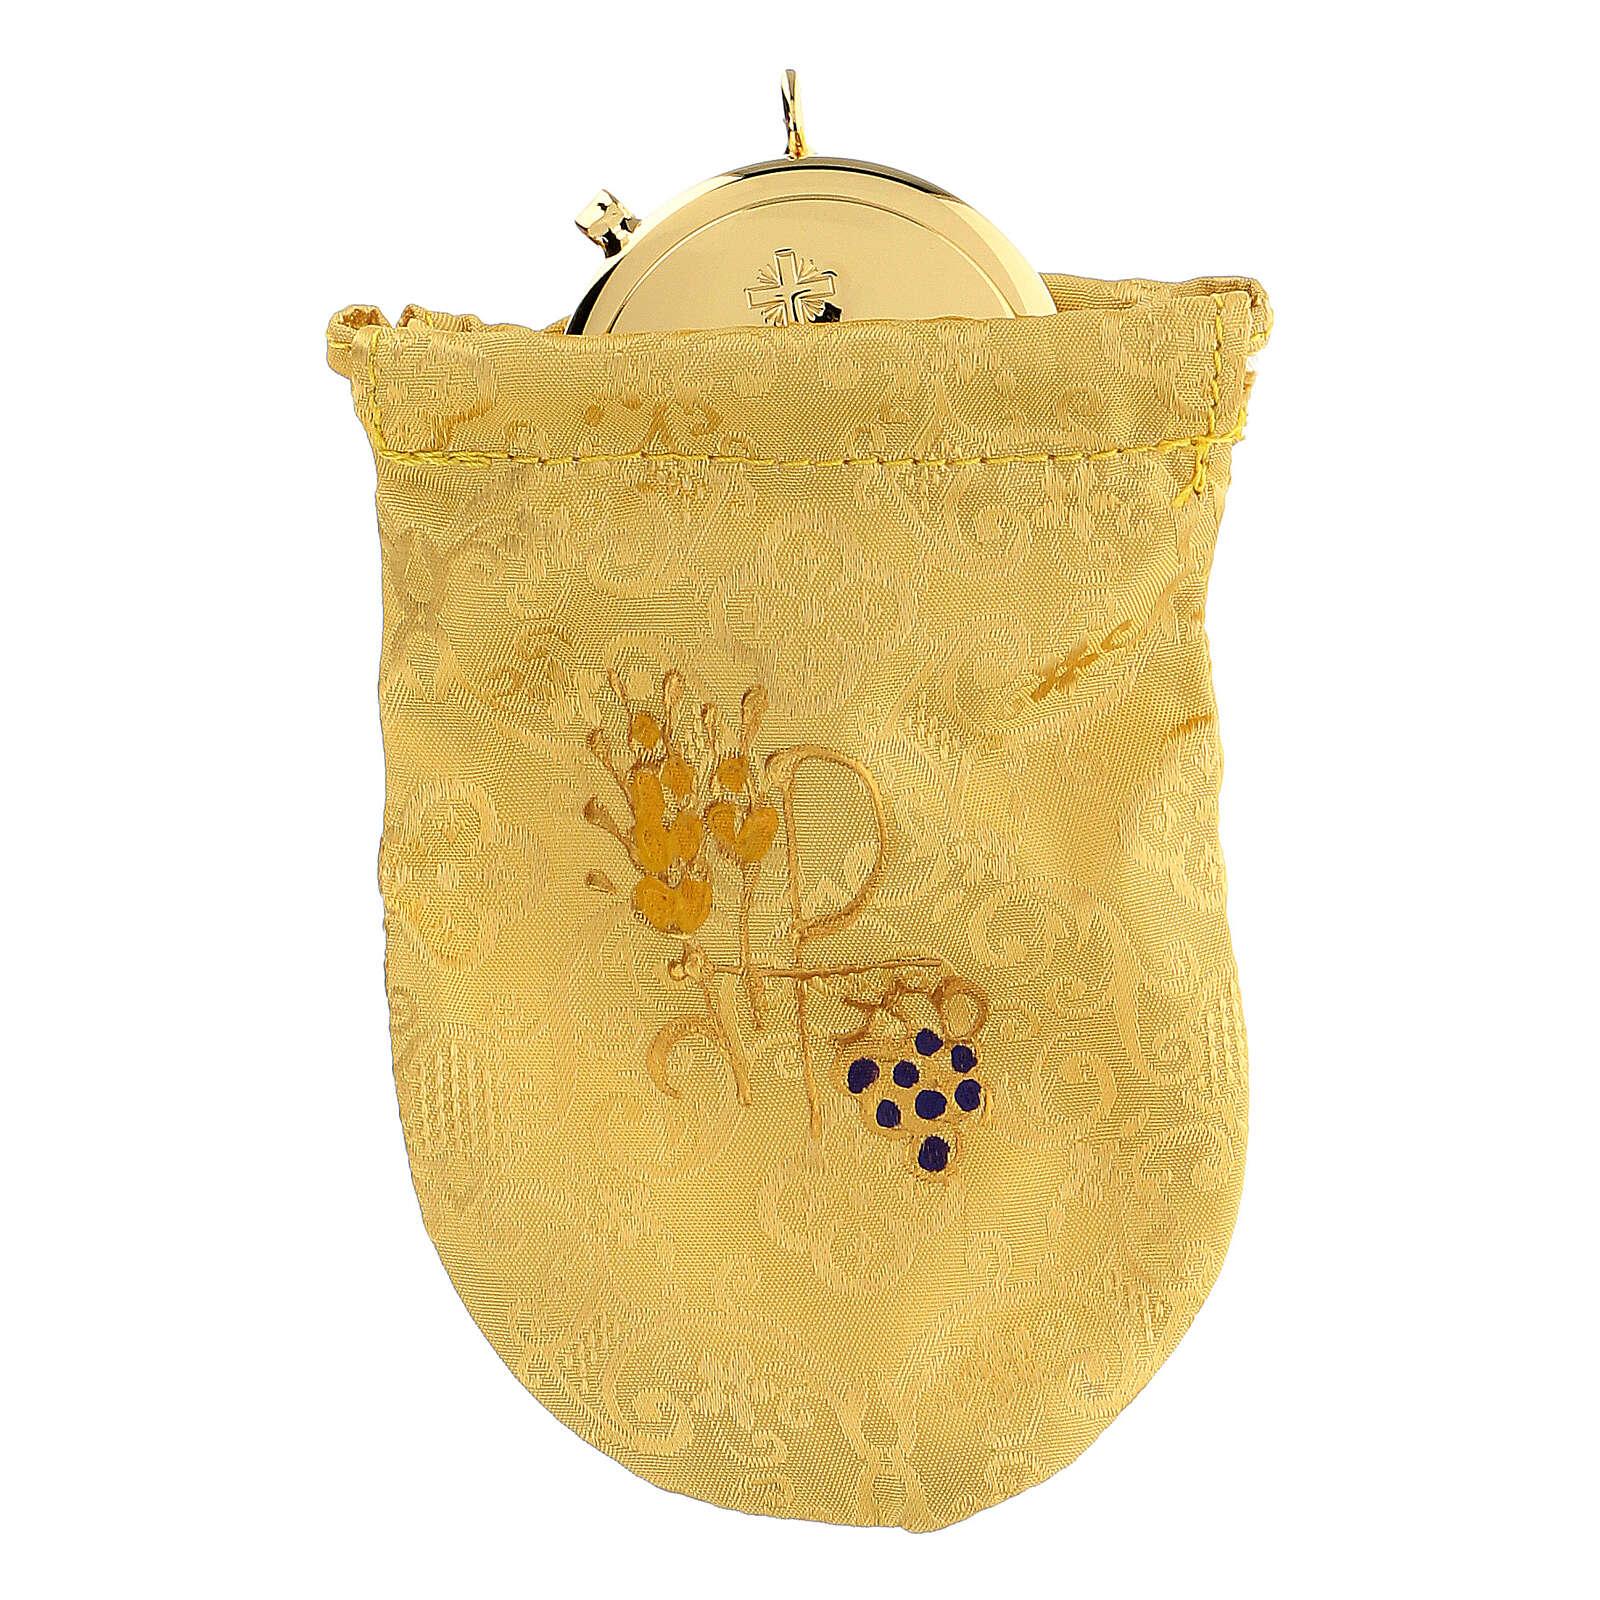 Bolsa para viático de jacquard amarillo relicario 8 cm 3